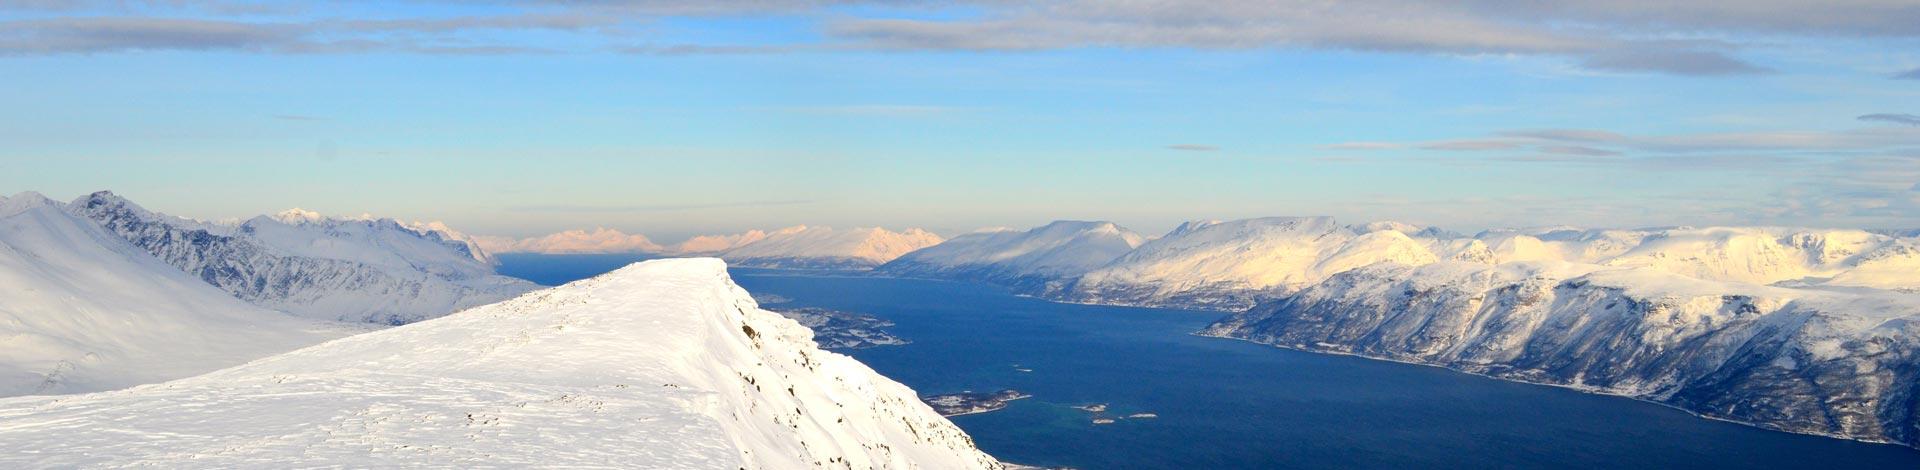 skitouren-norwegen-mit-schweizer-bergfuehrer-stephan-ruoss